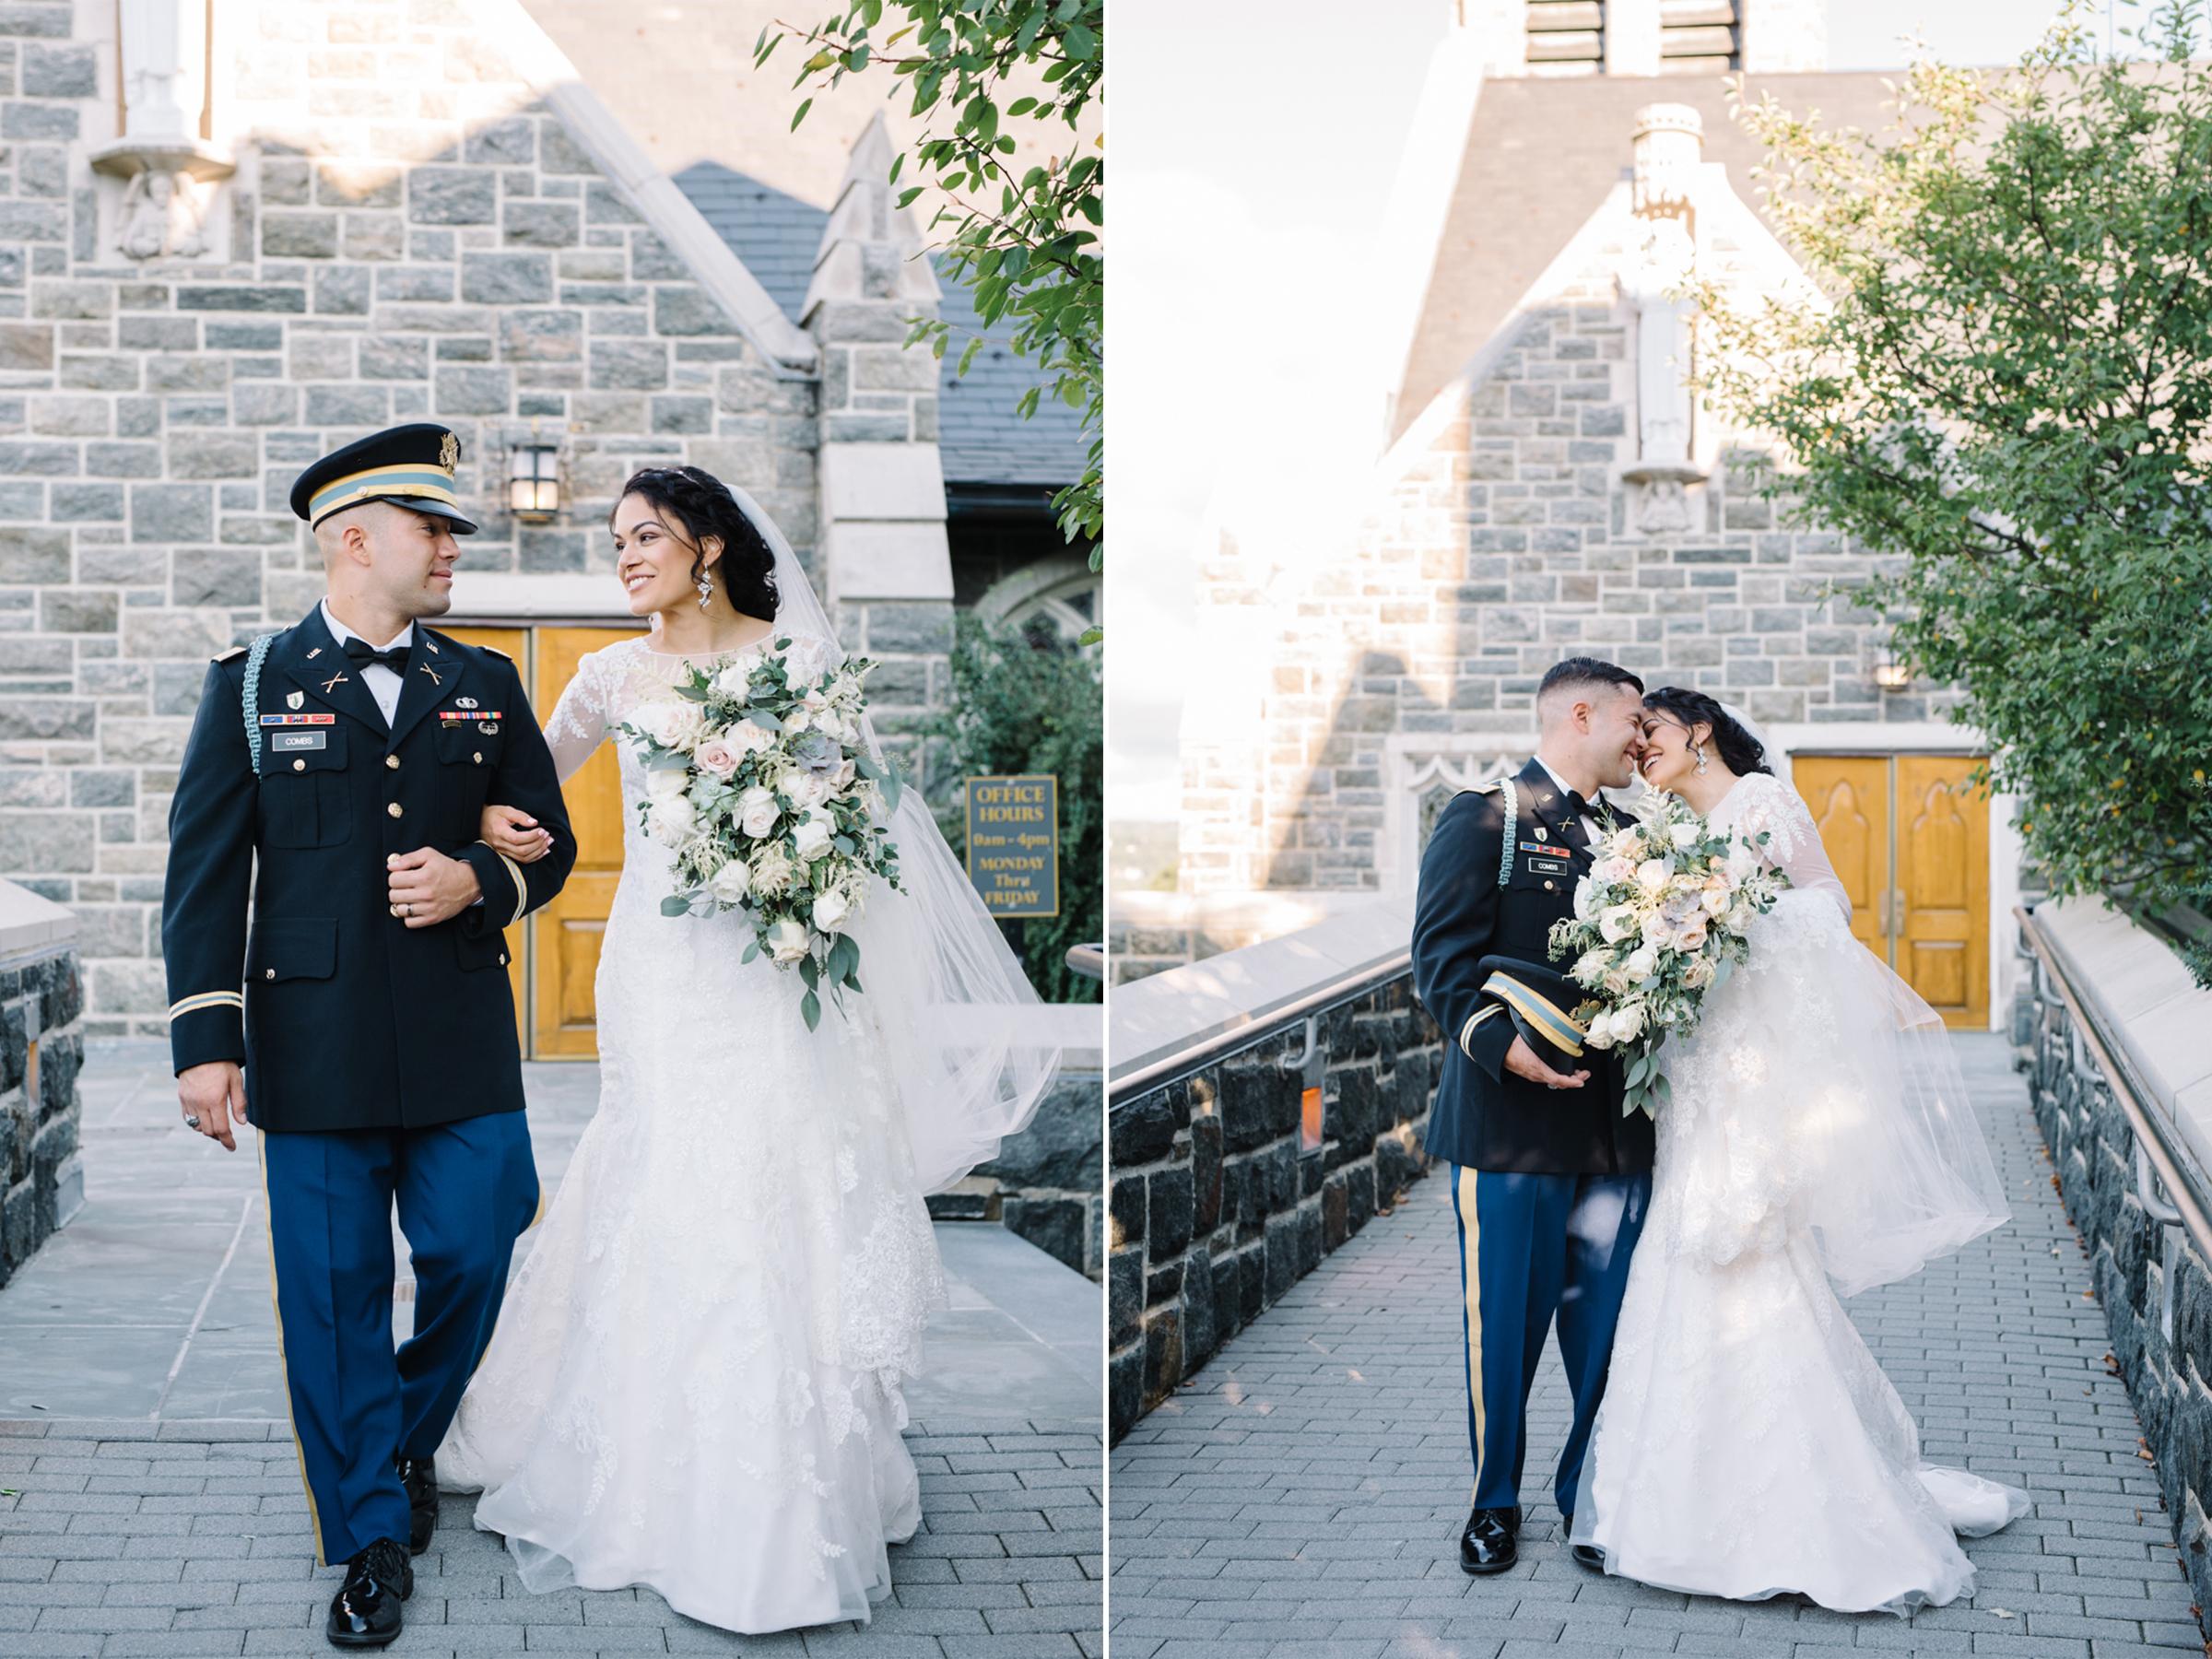 Military Wedding- West Point Army Academy-Most Holy Trinity Church-Lily of the Valley-Oleg Cassini- Olivia Christina Photo.jpg